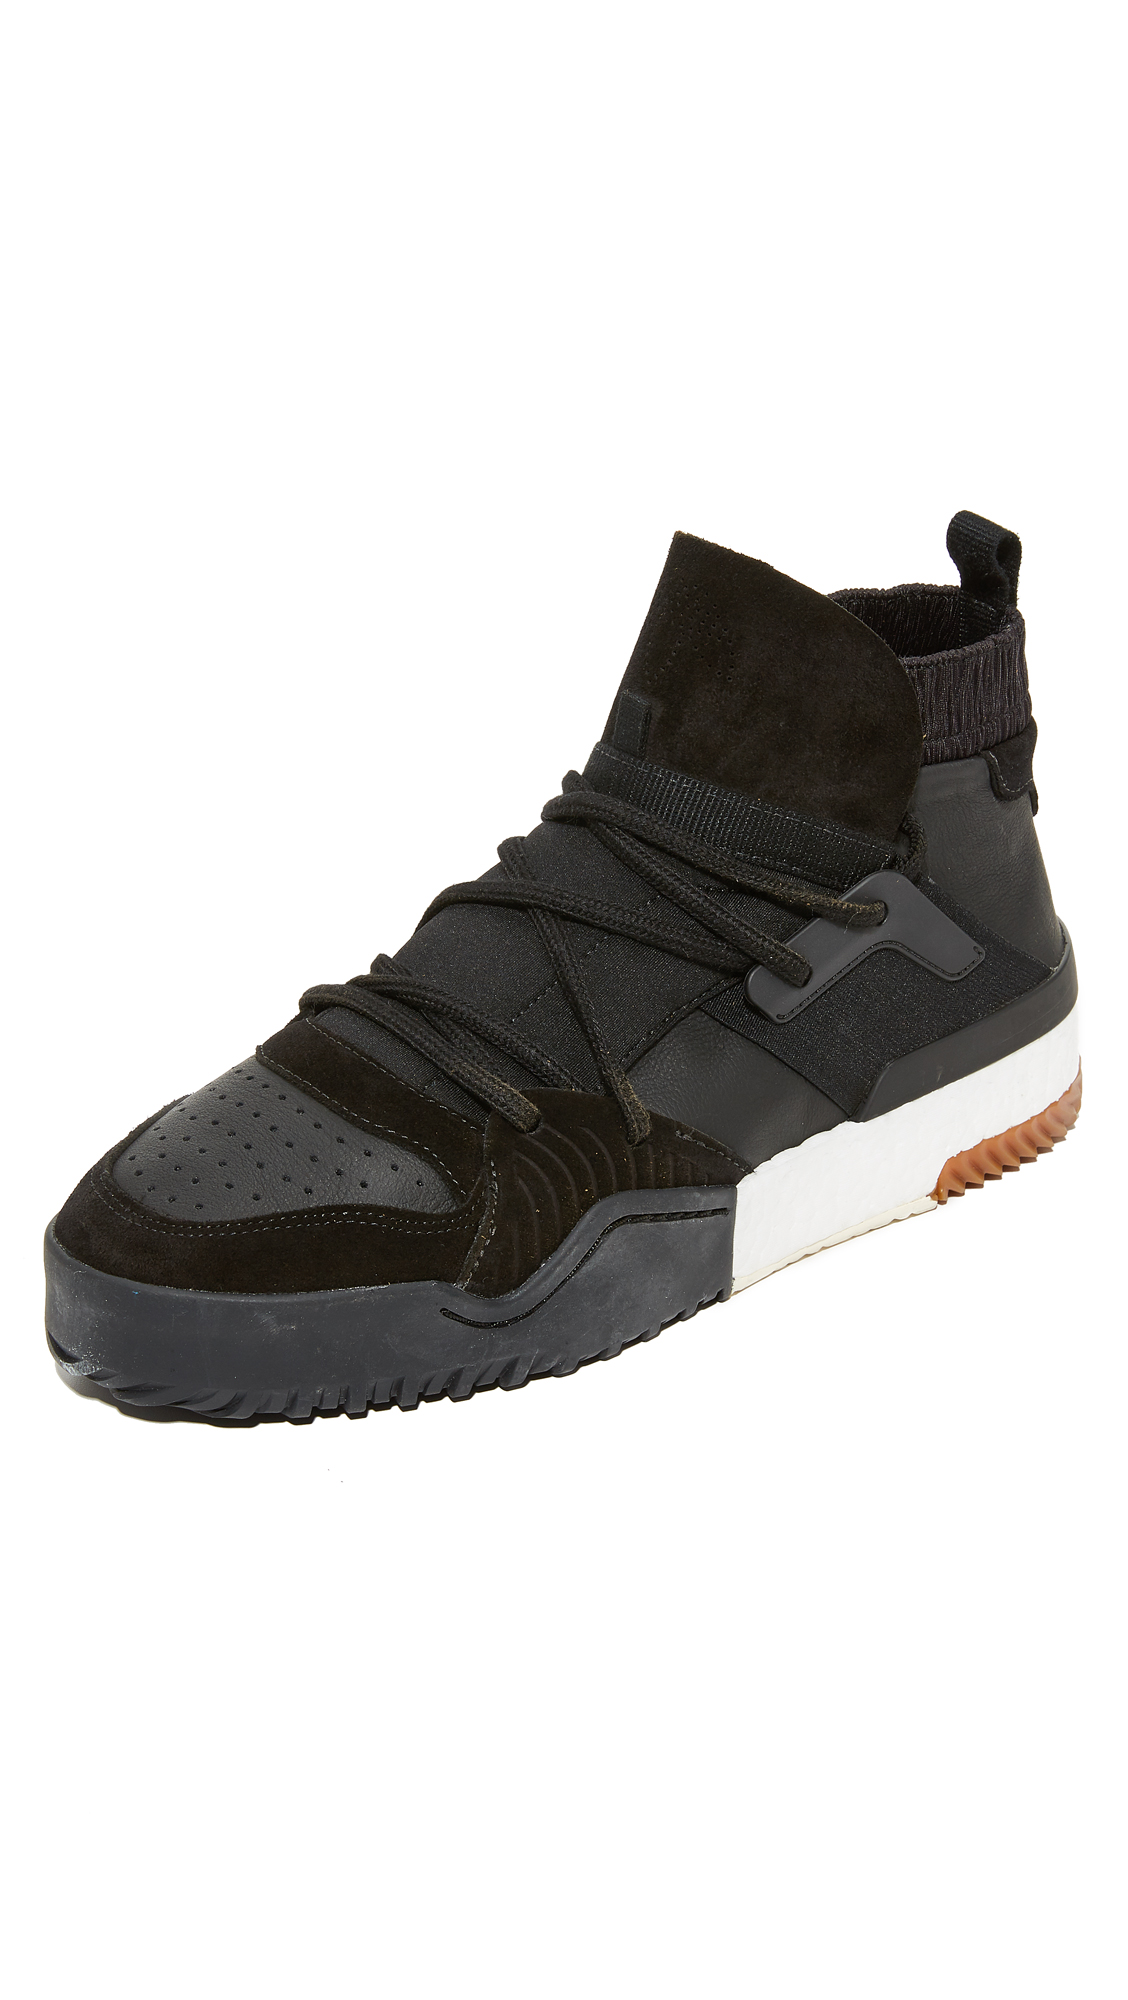 3d087f7c13ab ADIDAS ORIGINALS BY ALEXANDER WANG. Adidas Originals By Alexander Wang Aw  Bball Lo Sneakers ...